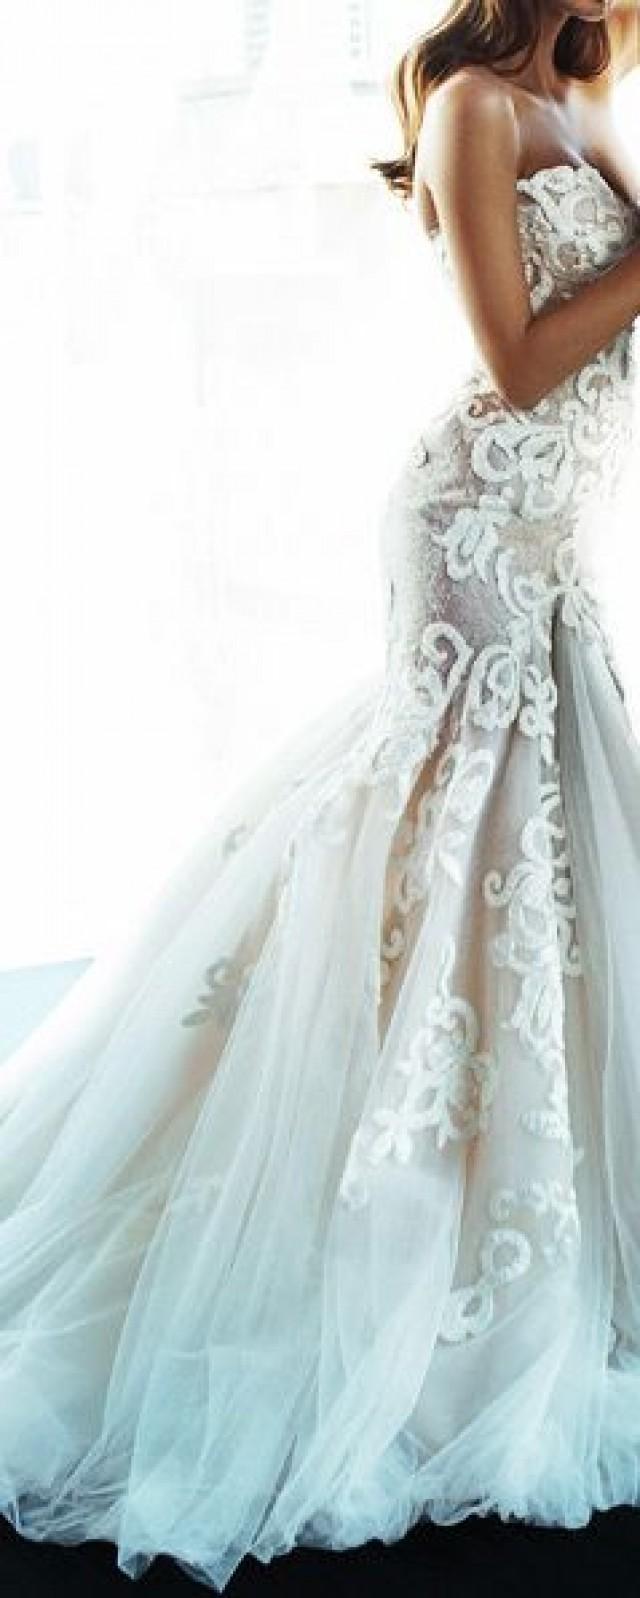 Body Shop Omaha >> Sleeveless Wedding Gown Made Of Netted Fabric #2036312 - Weddbook